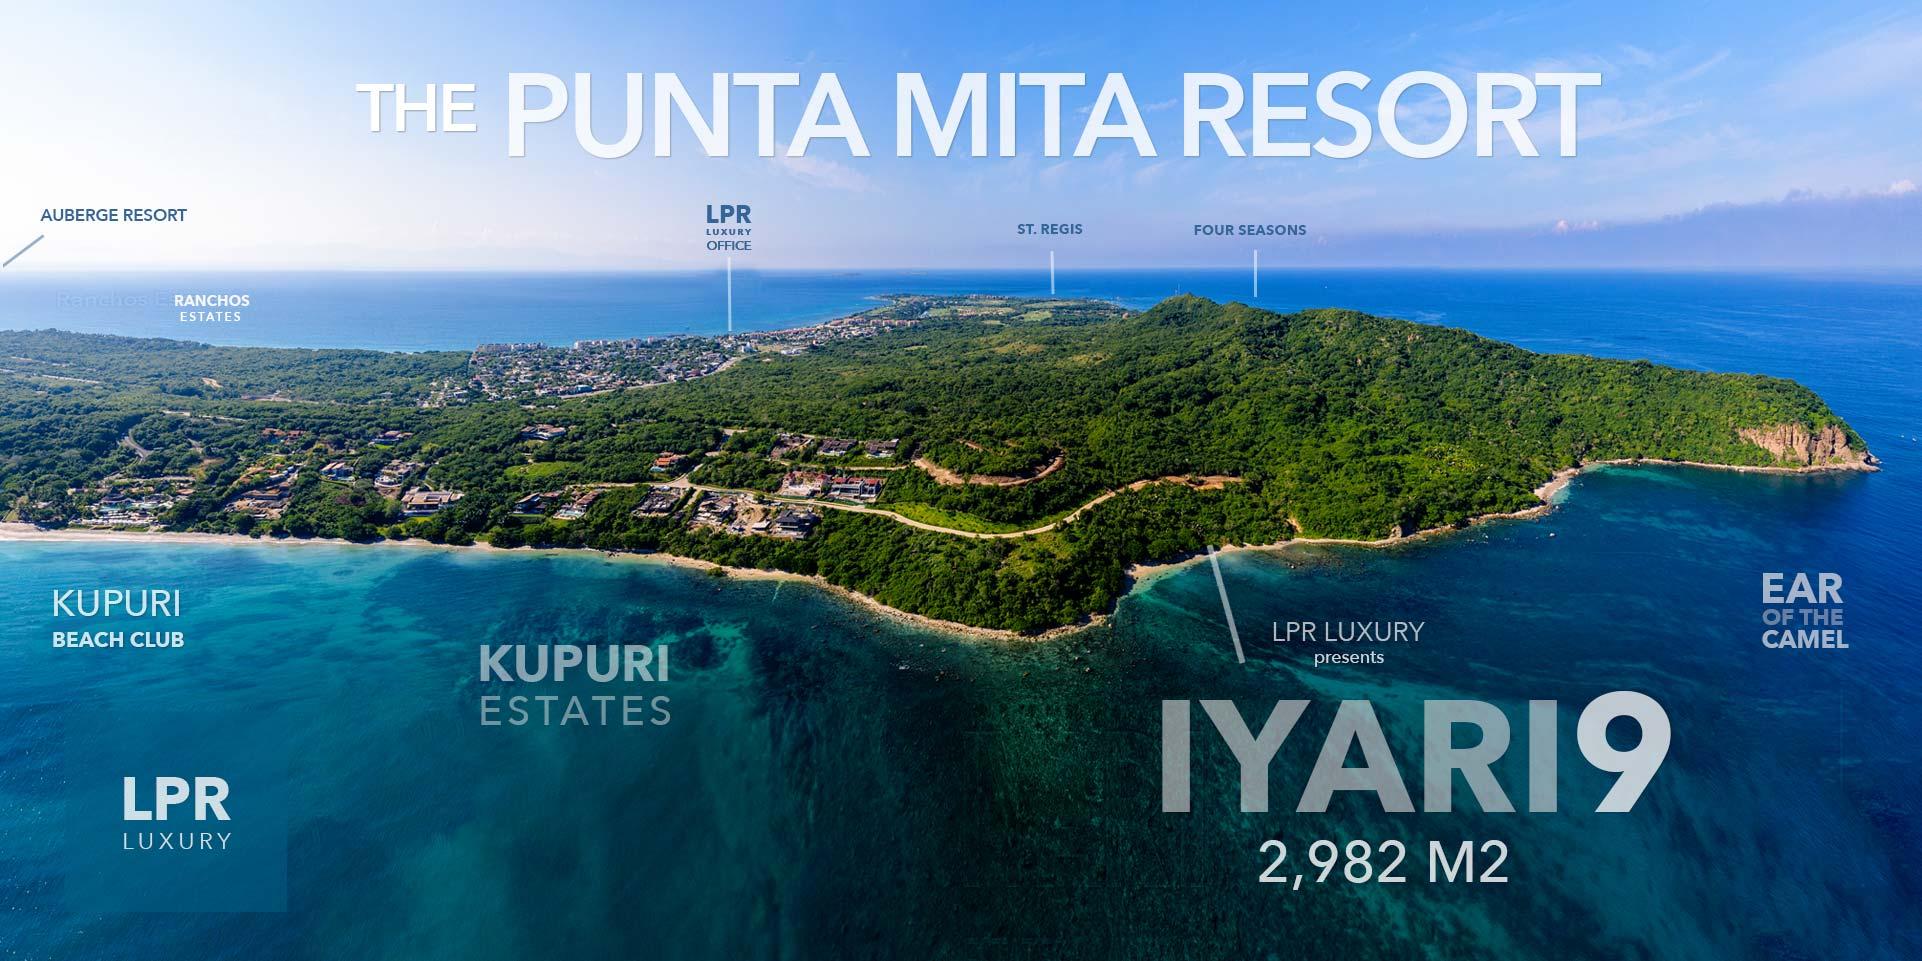 Iyari Estates 9 - Luxury homesite building lot for sale at the Punta Mita Resort, Riviera Nayarit, Mexico